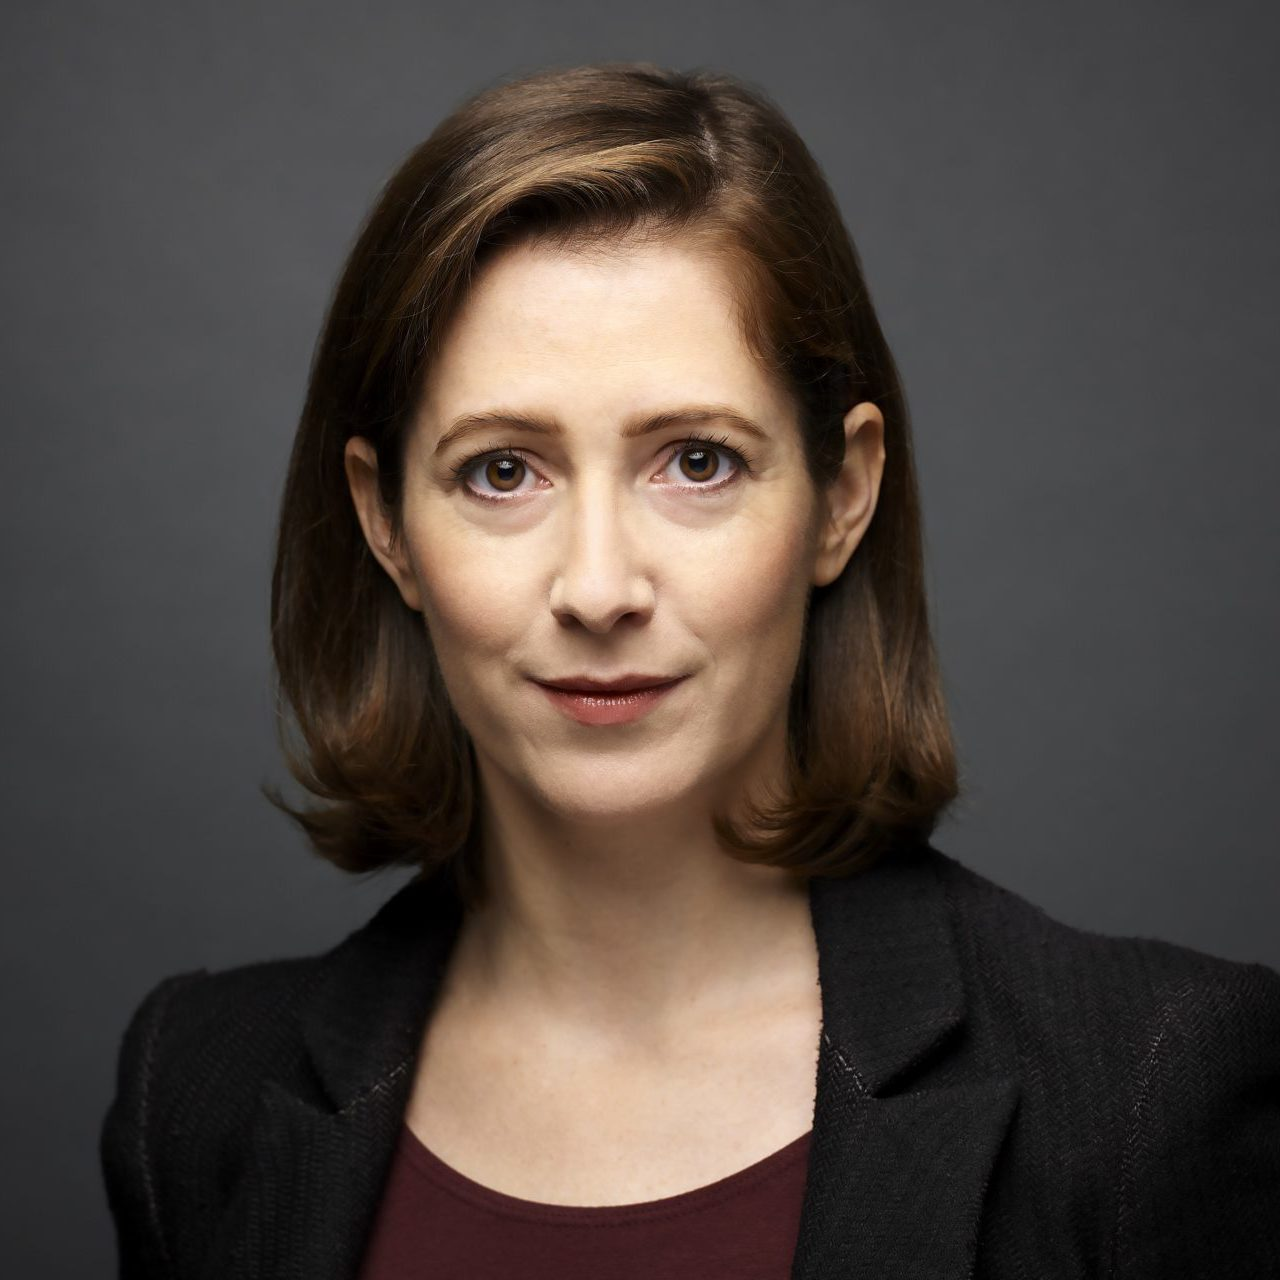 Kaitlyn Riordan